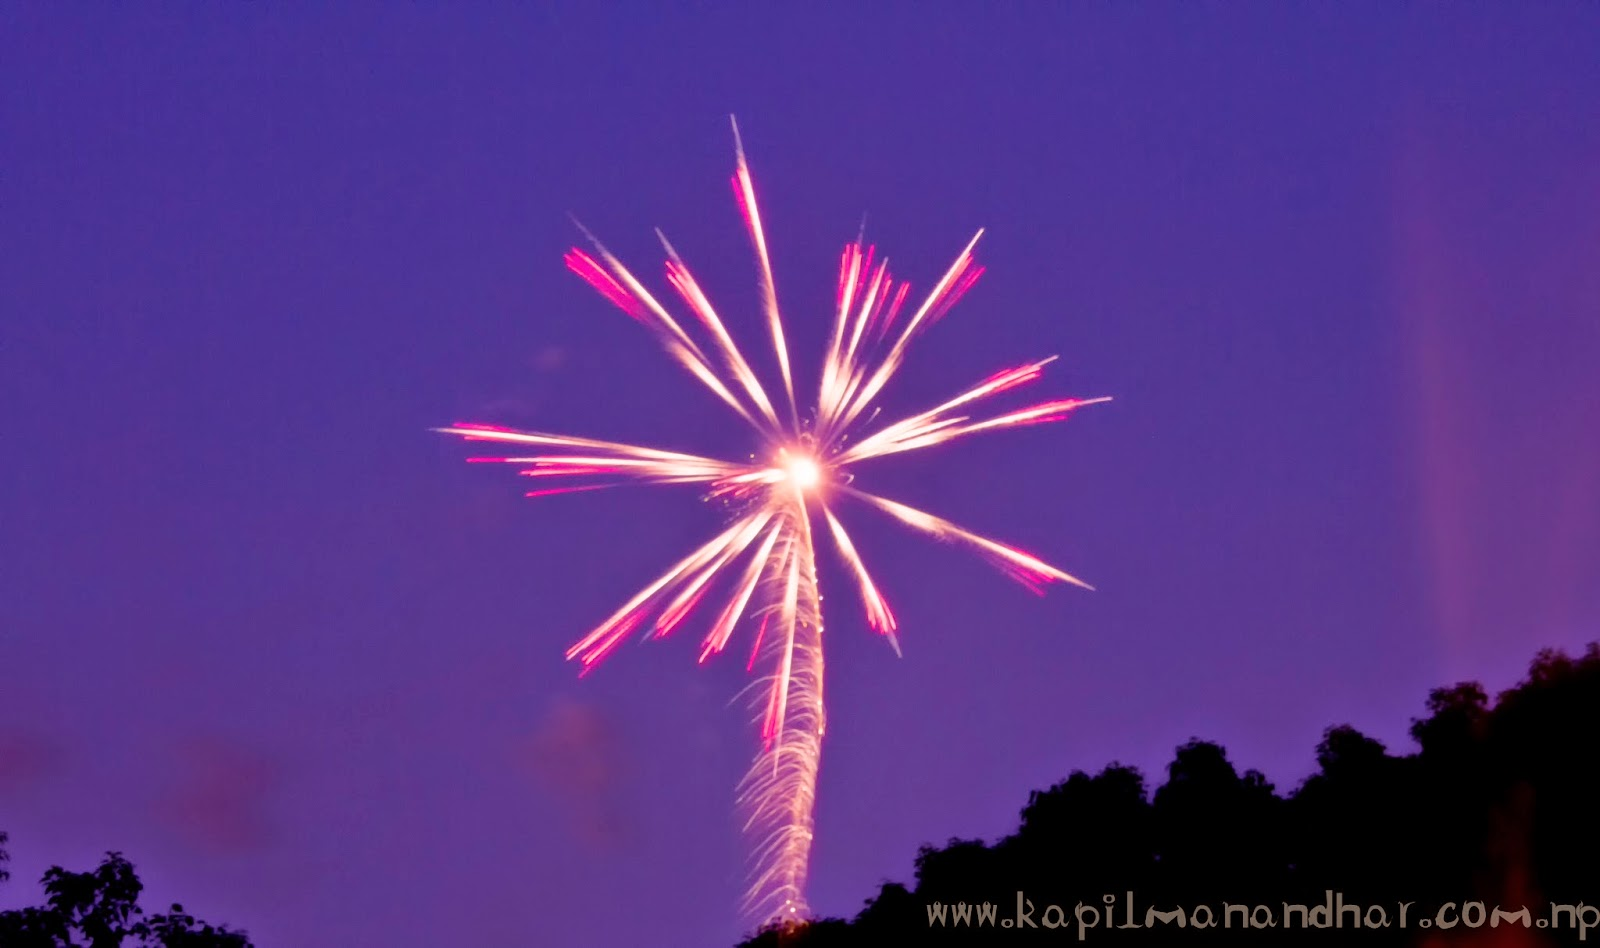 Fireworks Tokyo 26th July, 2014 花火大会 2014年7月26日 東京